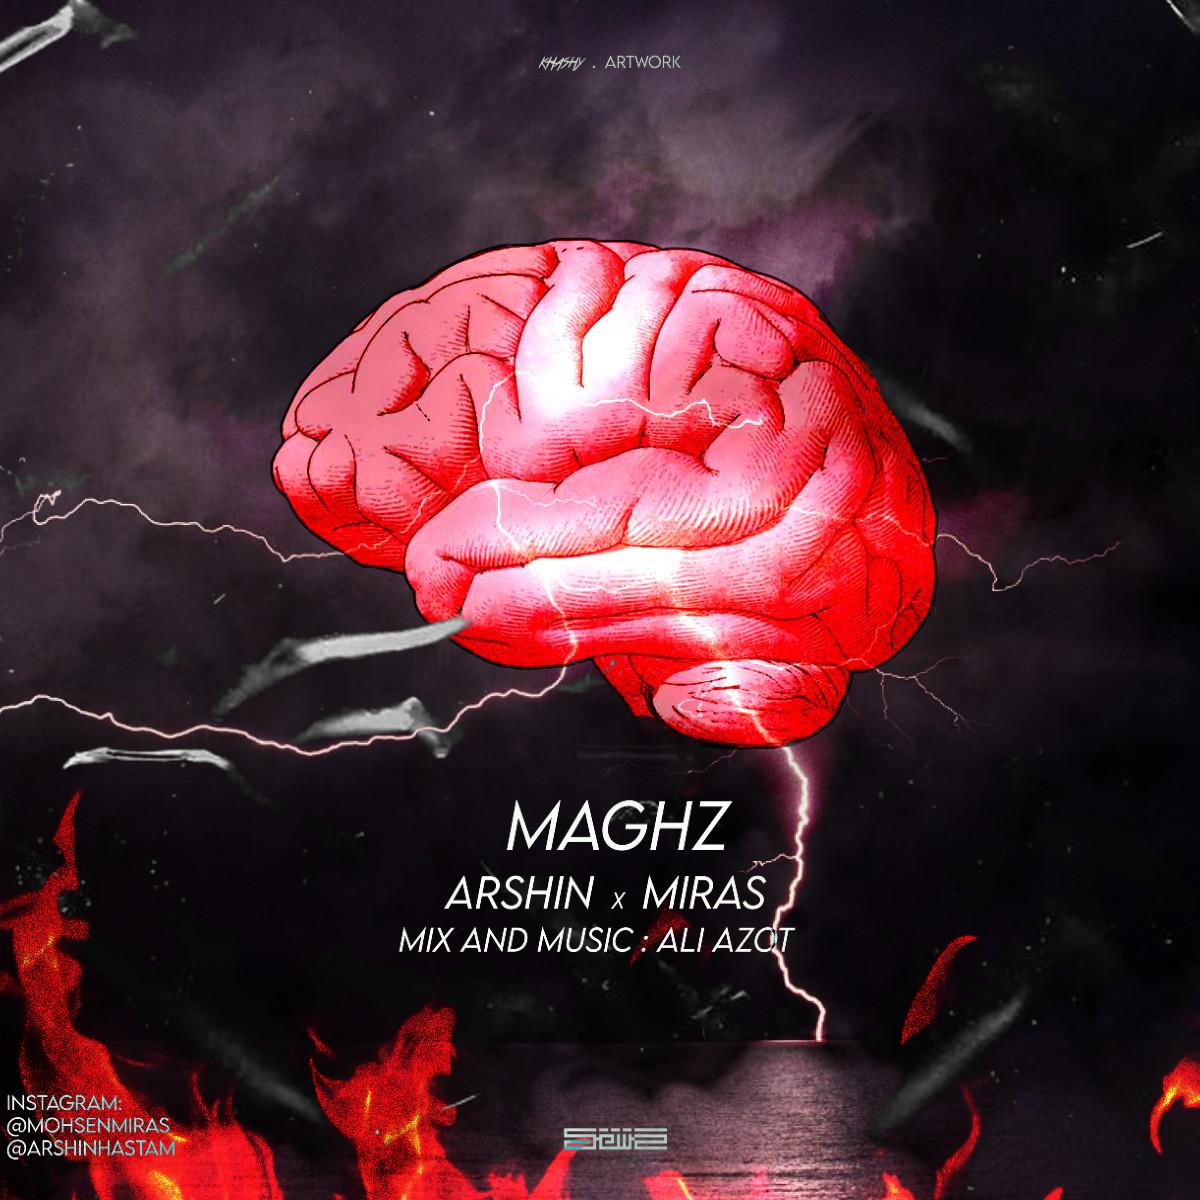 Arshin & Miras - Maghz